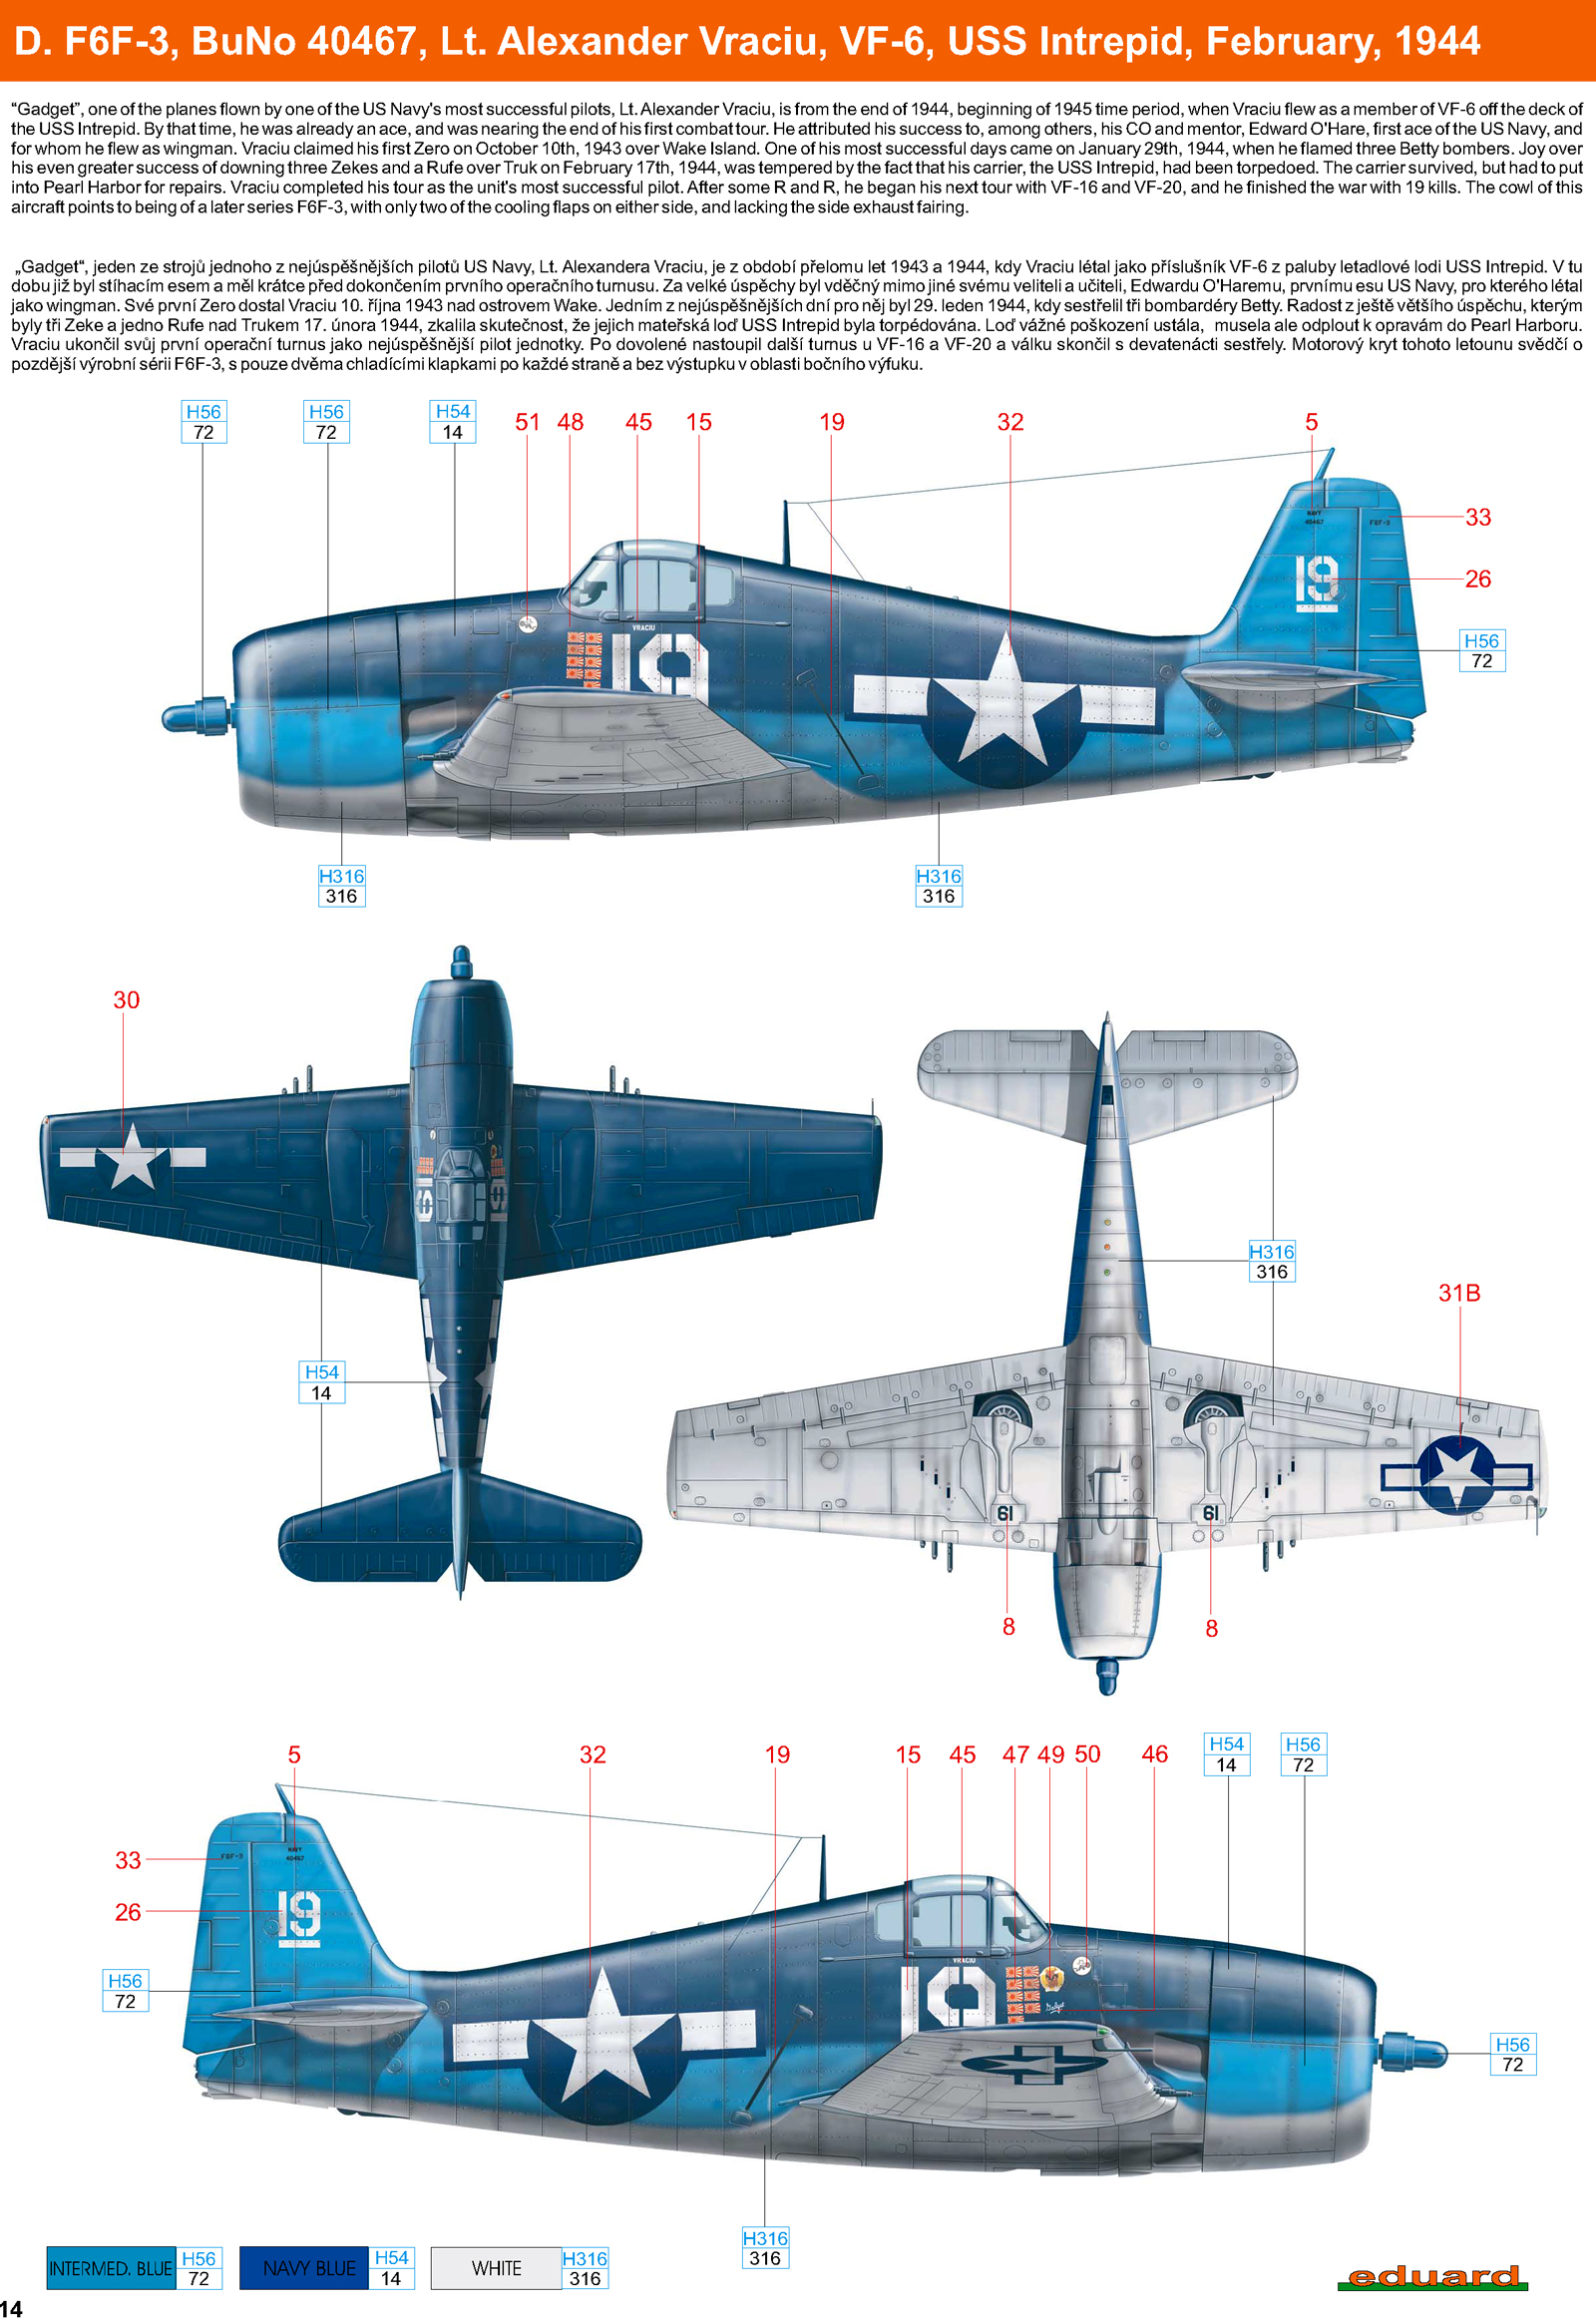 Grumman F6F 3 Hellcat VF 6 White 19 Alexander Vraciu BuNo 40467 USS Intrepid Feb 1944 0C